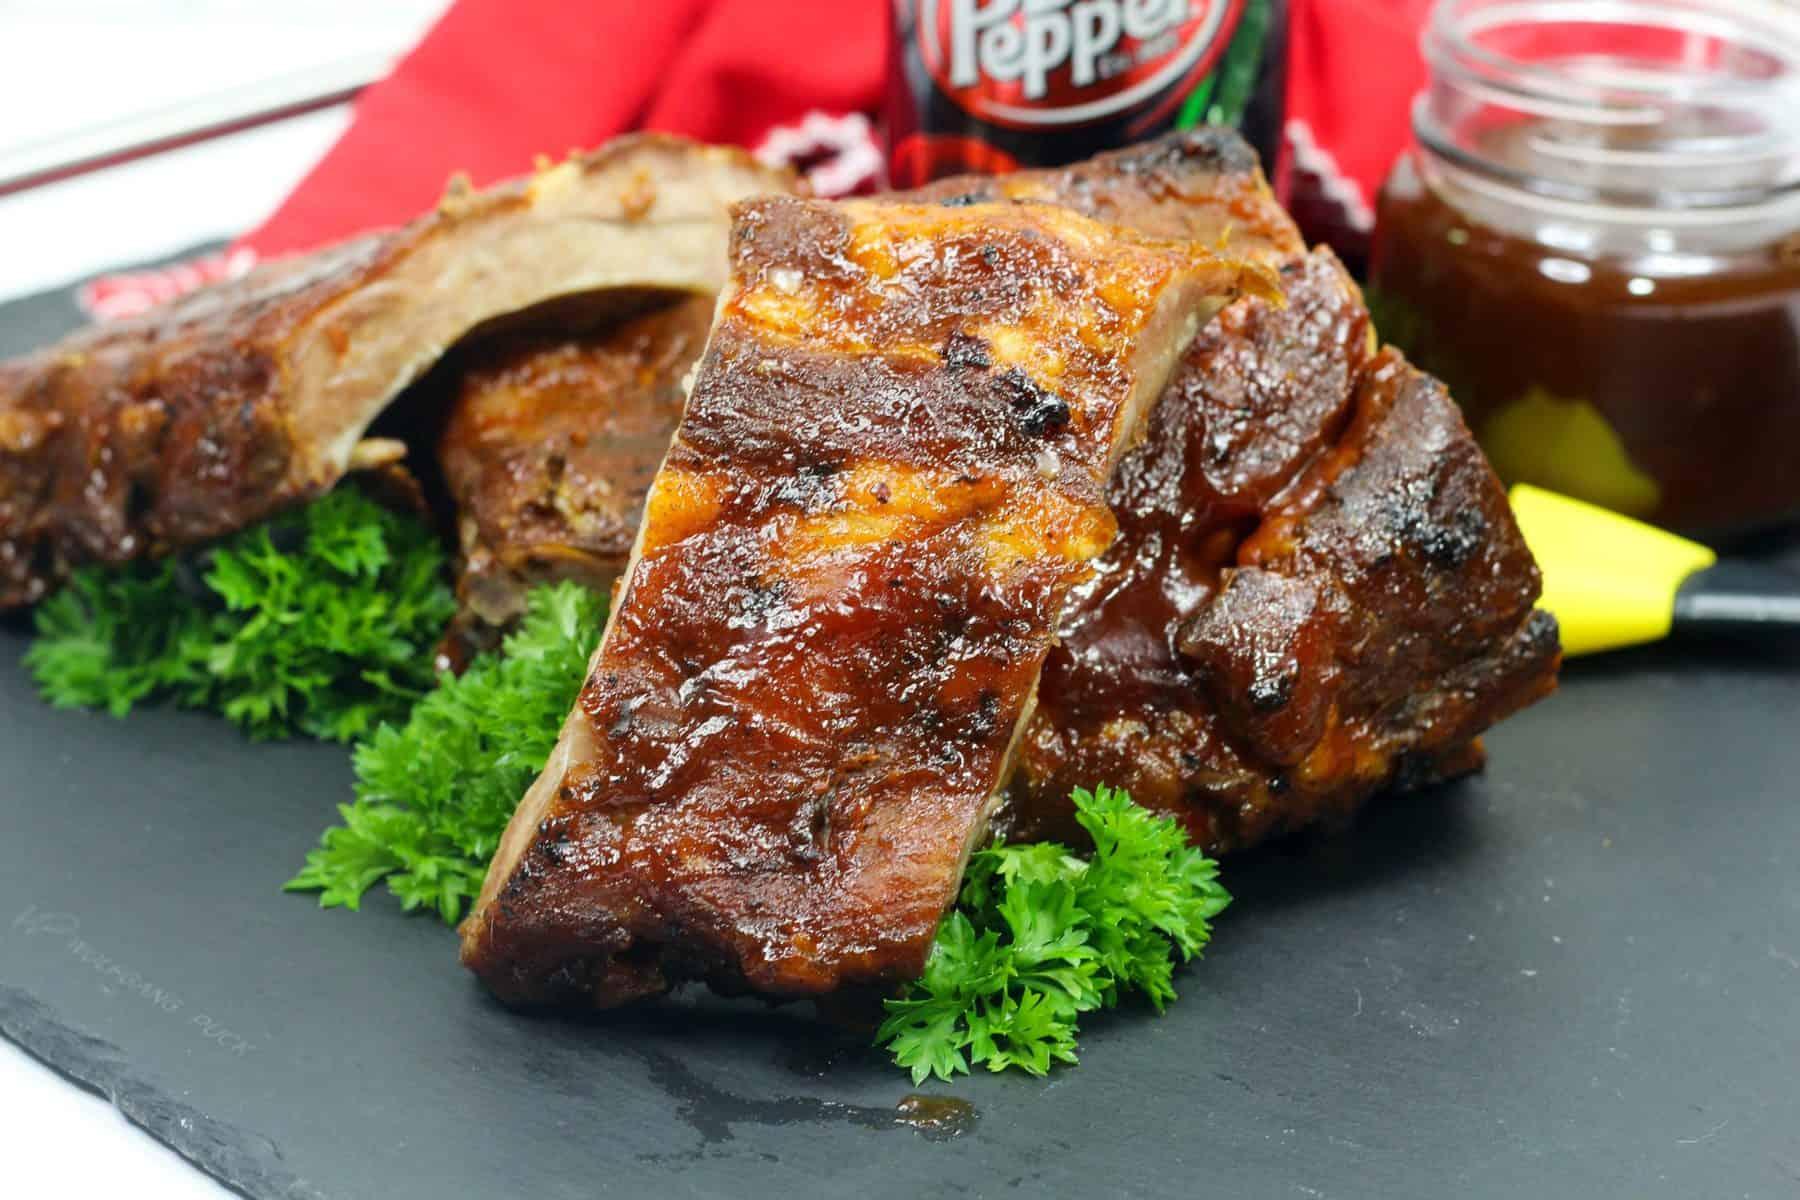 dr pepper pork rib recipe, dr pepper marinade